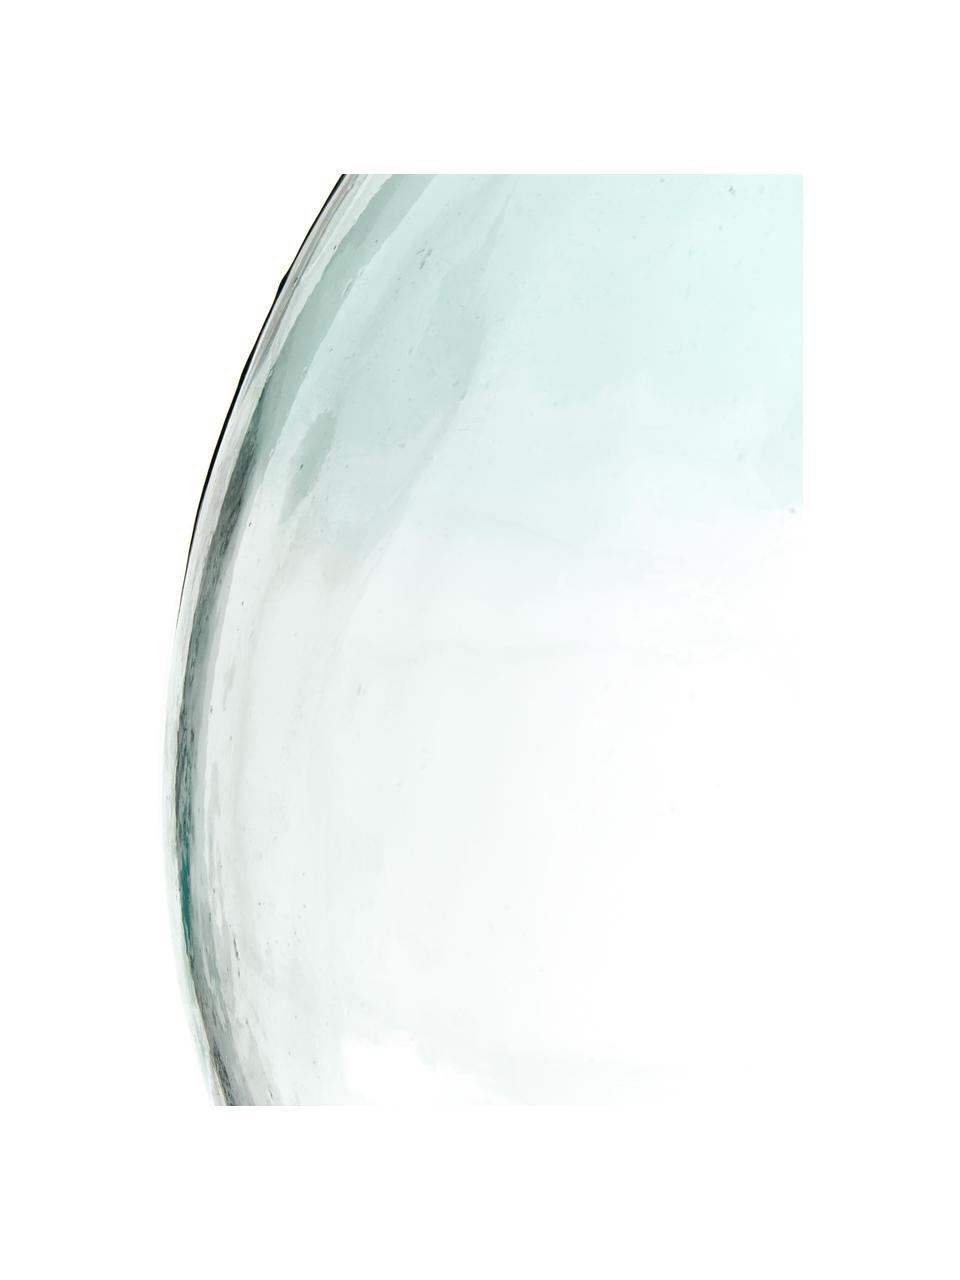 Vaso da pavimento in vetro riciclato Mikkel, Vetro riciclato, Azzurro, Ø 40 x Alt. 56 cm